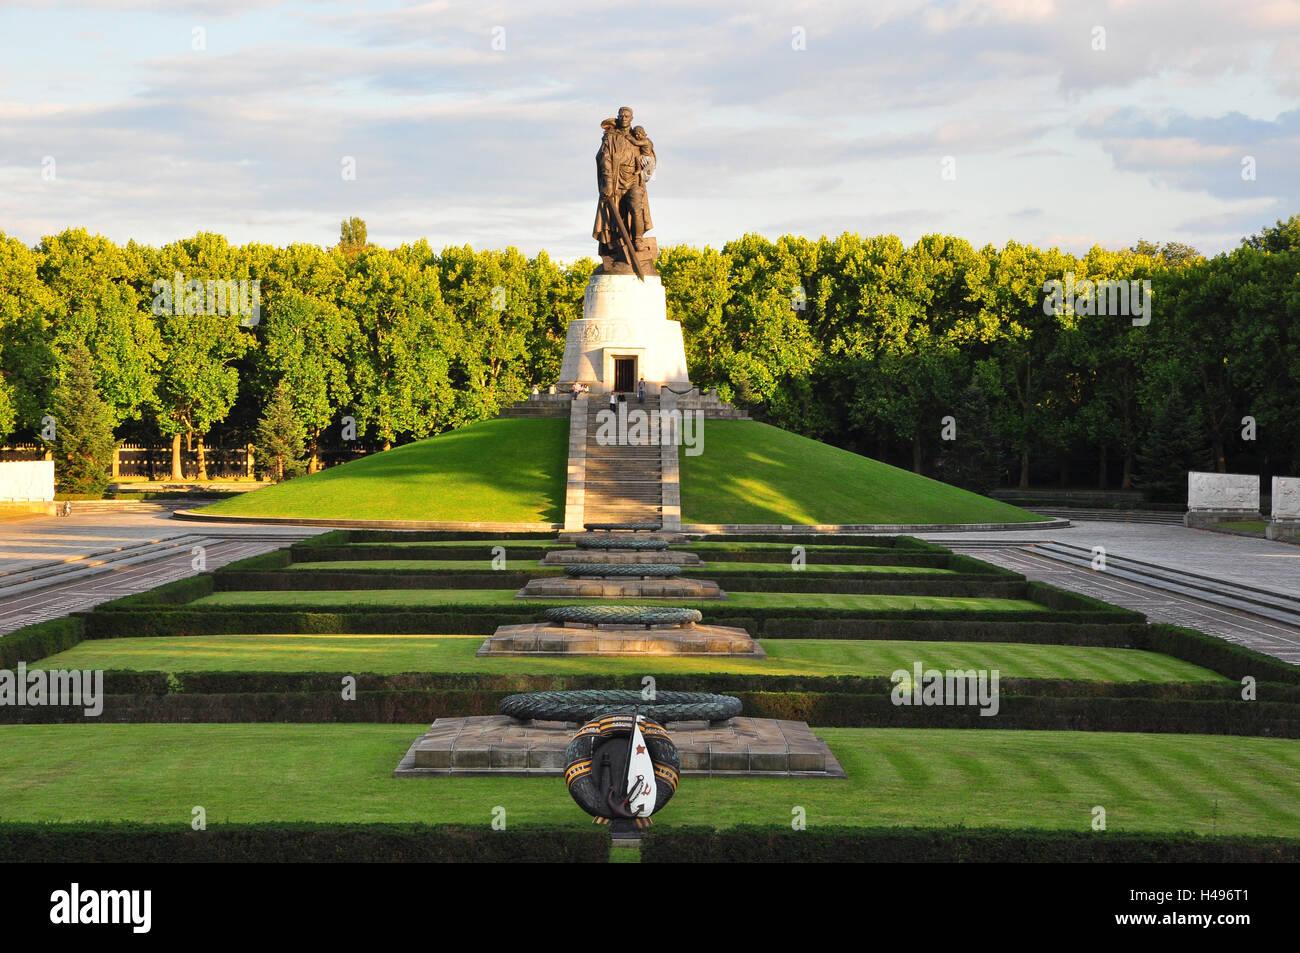 Soviet memorial dedicated to cosmonauts from kaliningrad - Germany Berlin Treptow Soviet Monument Stock Image